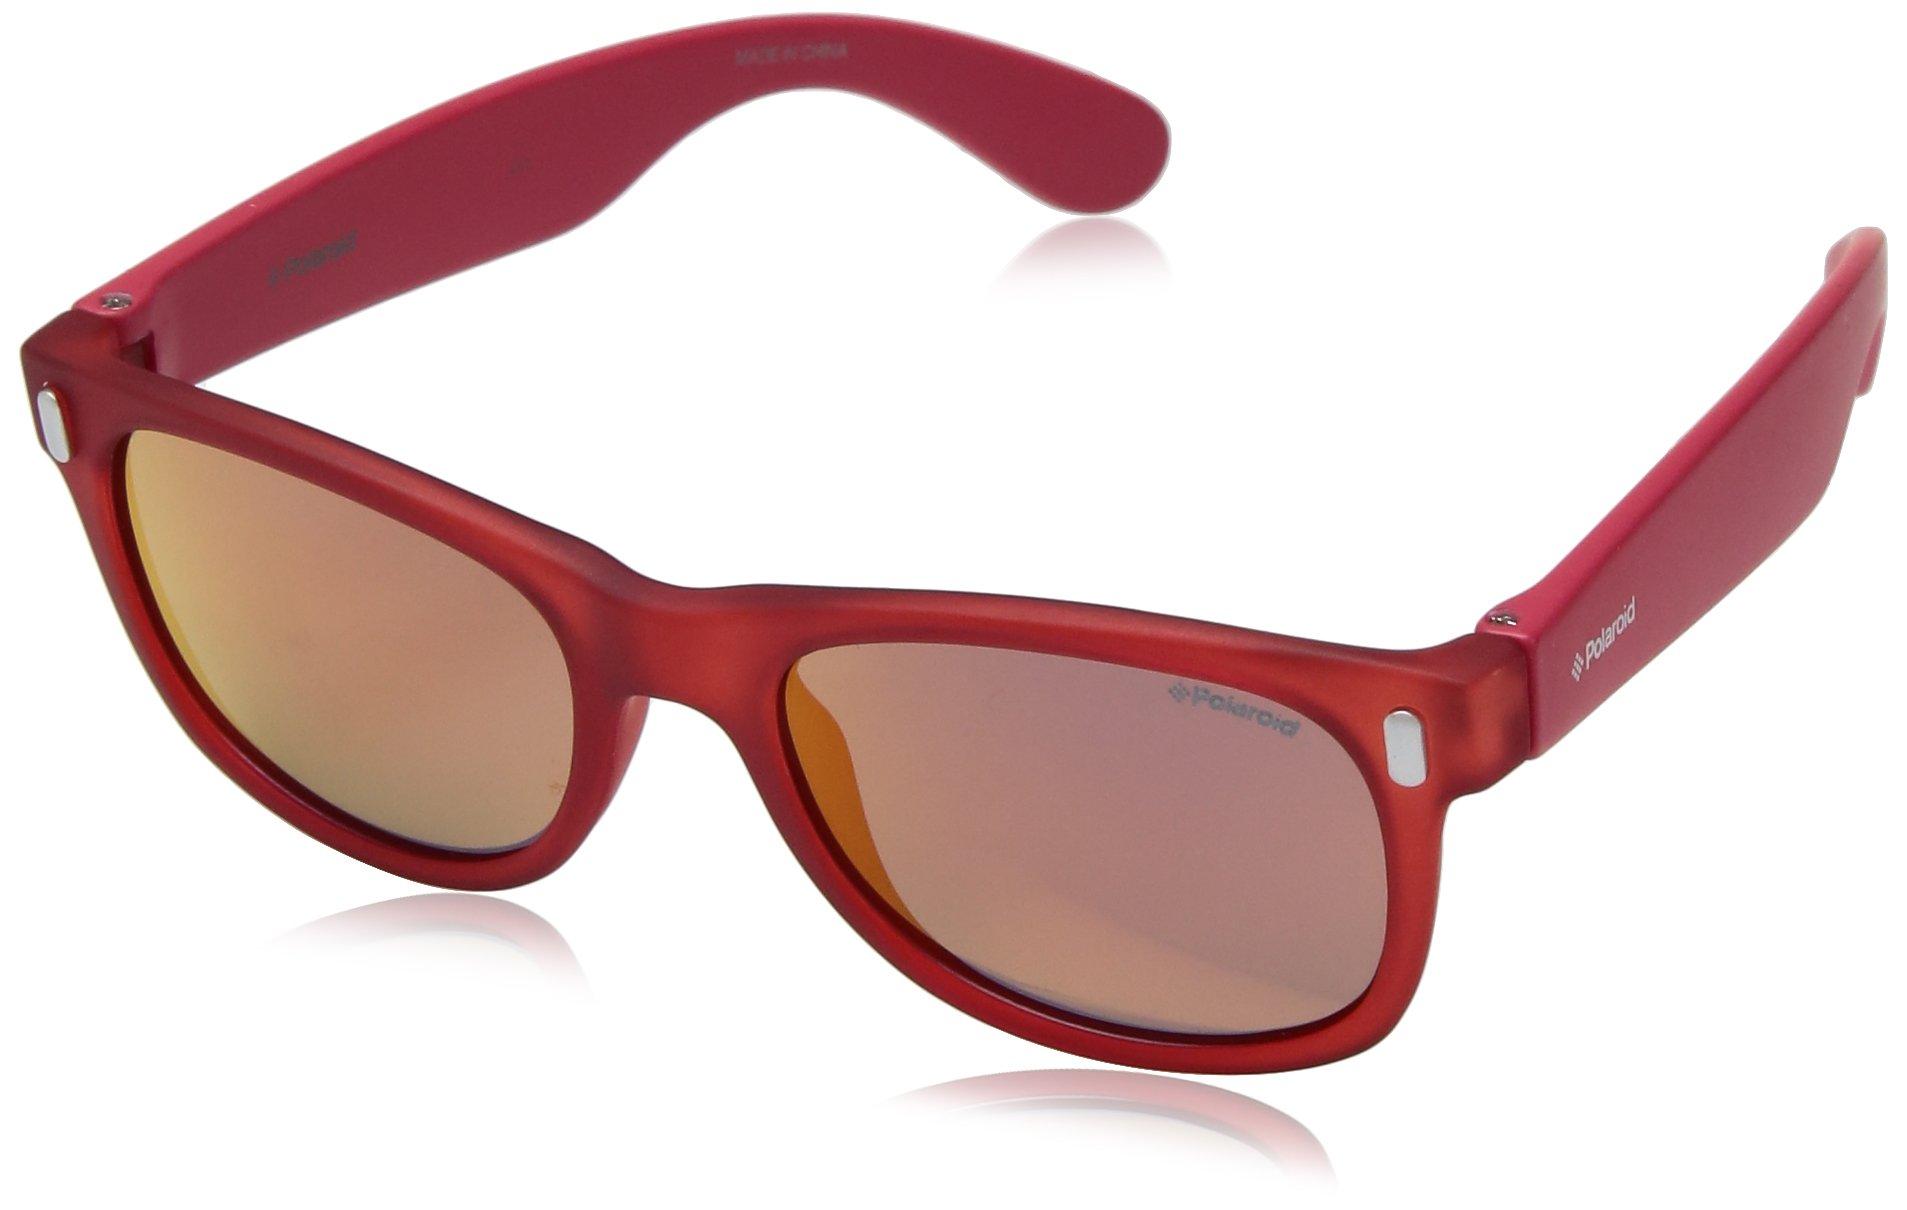 Polaroid Sunglasses Boys' P0115s Polarized Rectangular Sunglasses, CRYST RED, 46 mm